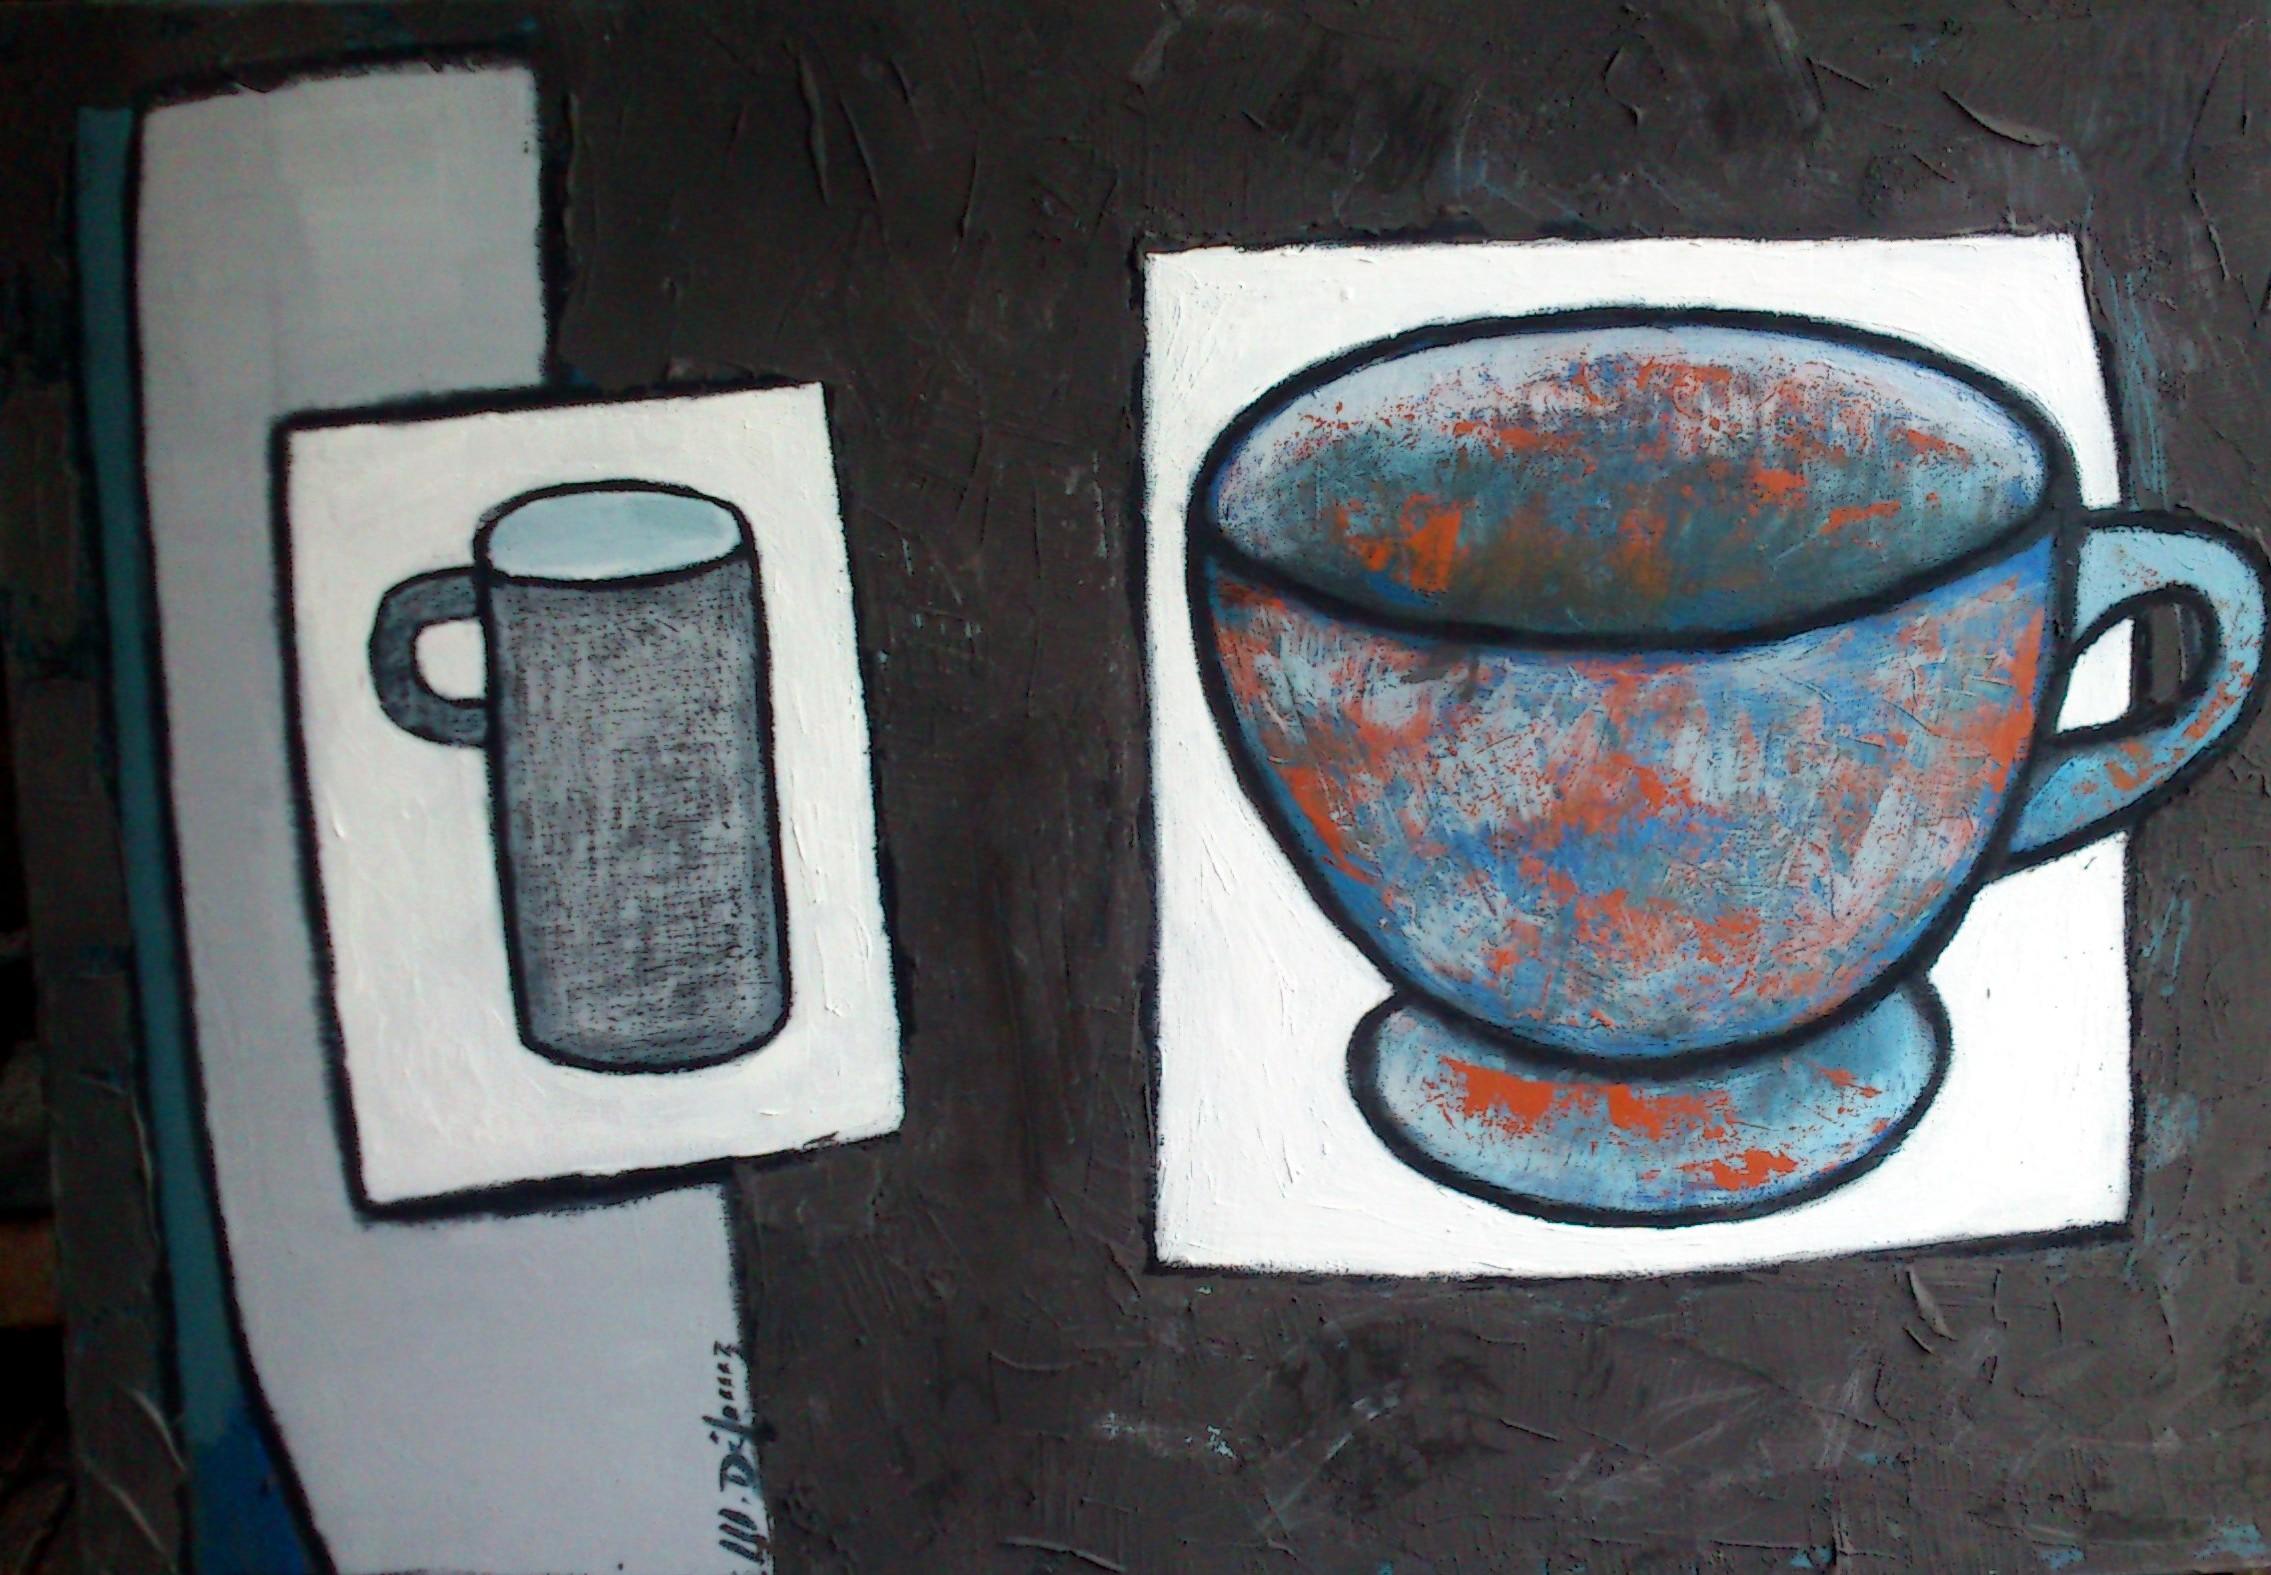 Le bol et la tasse